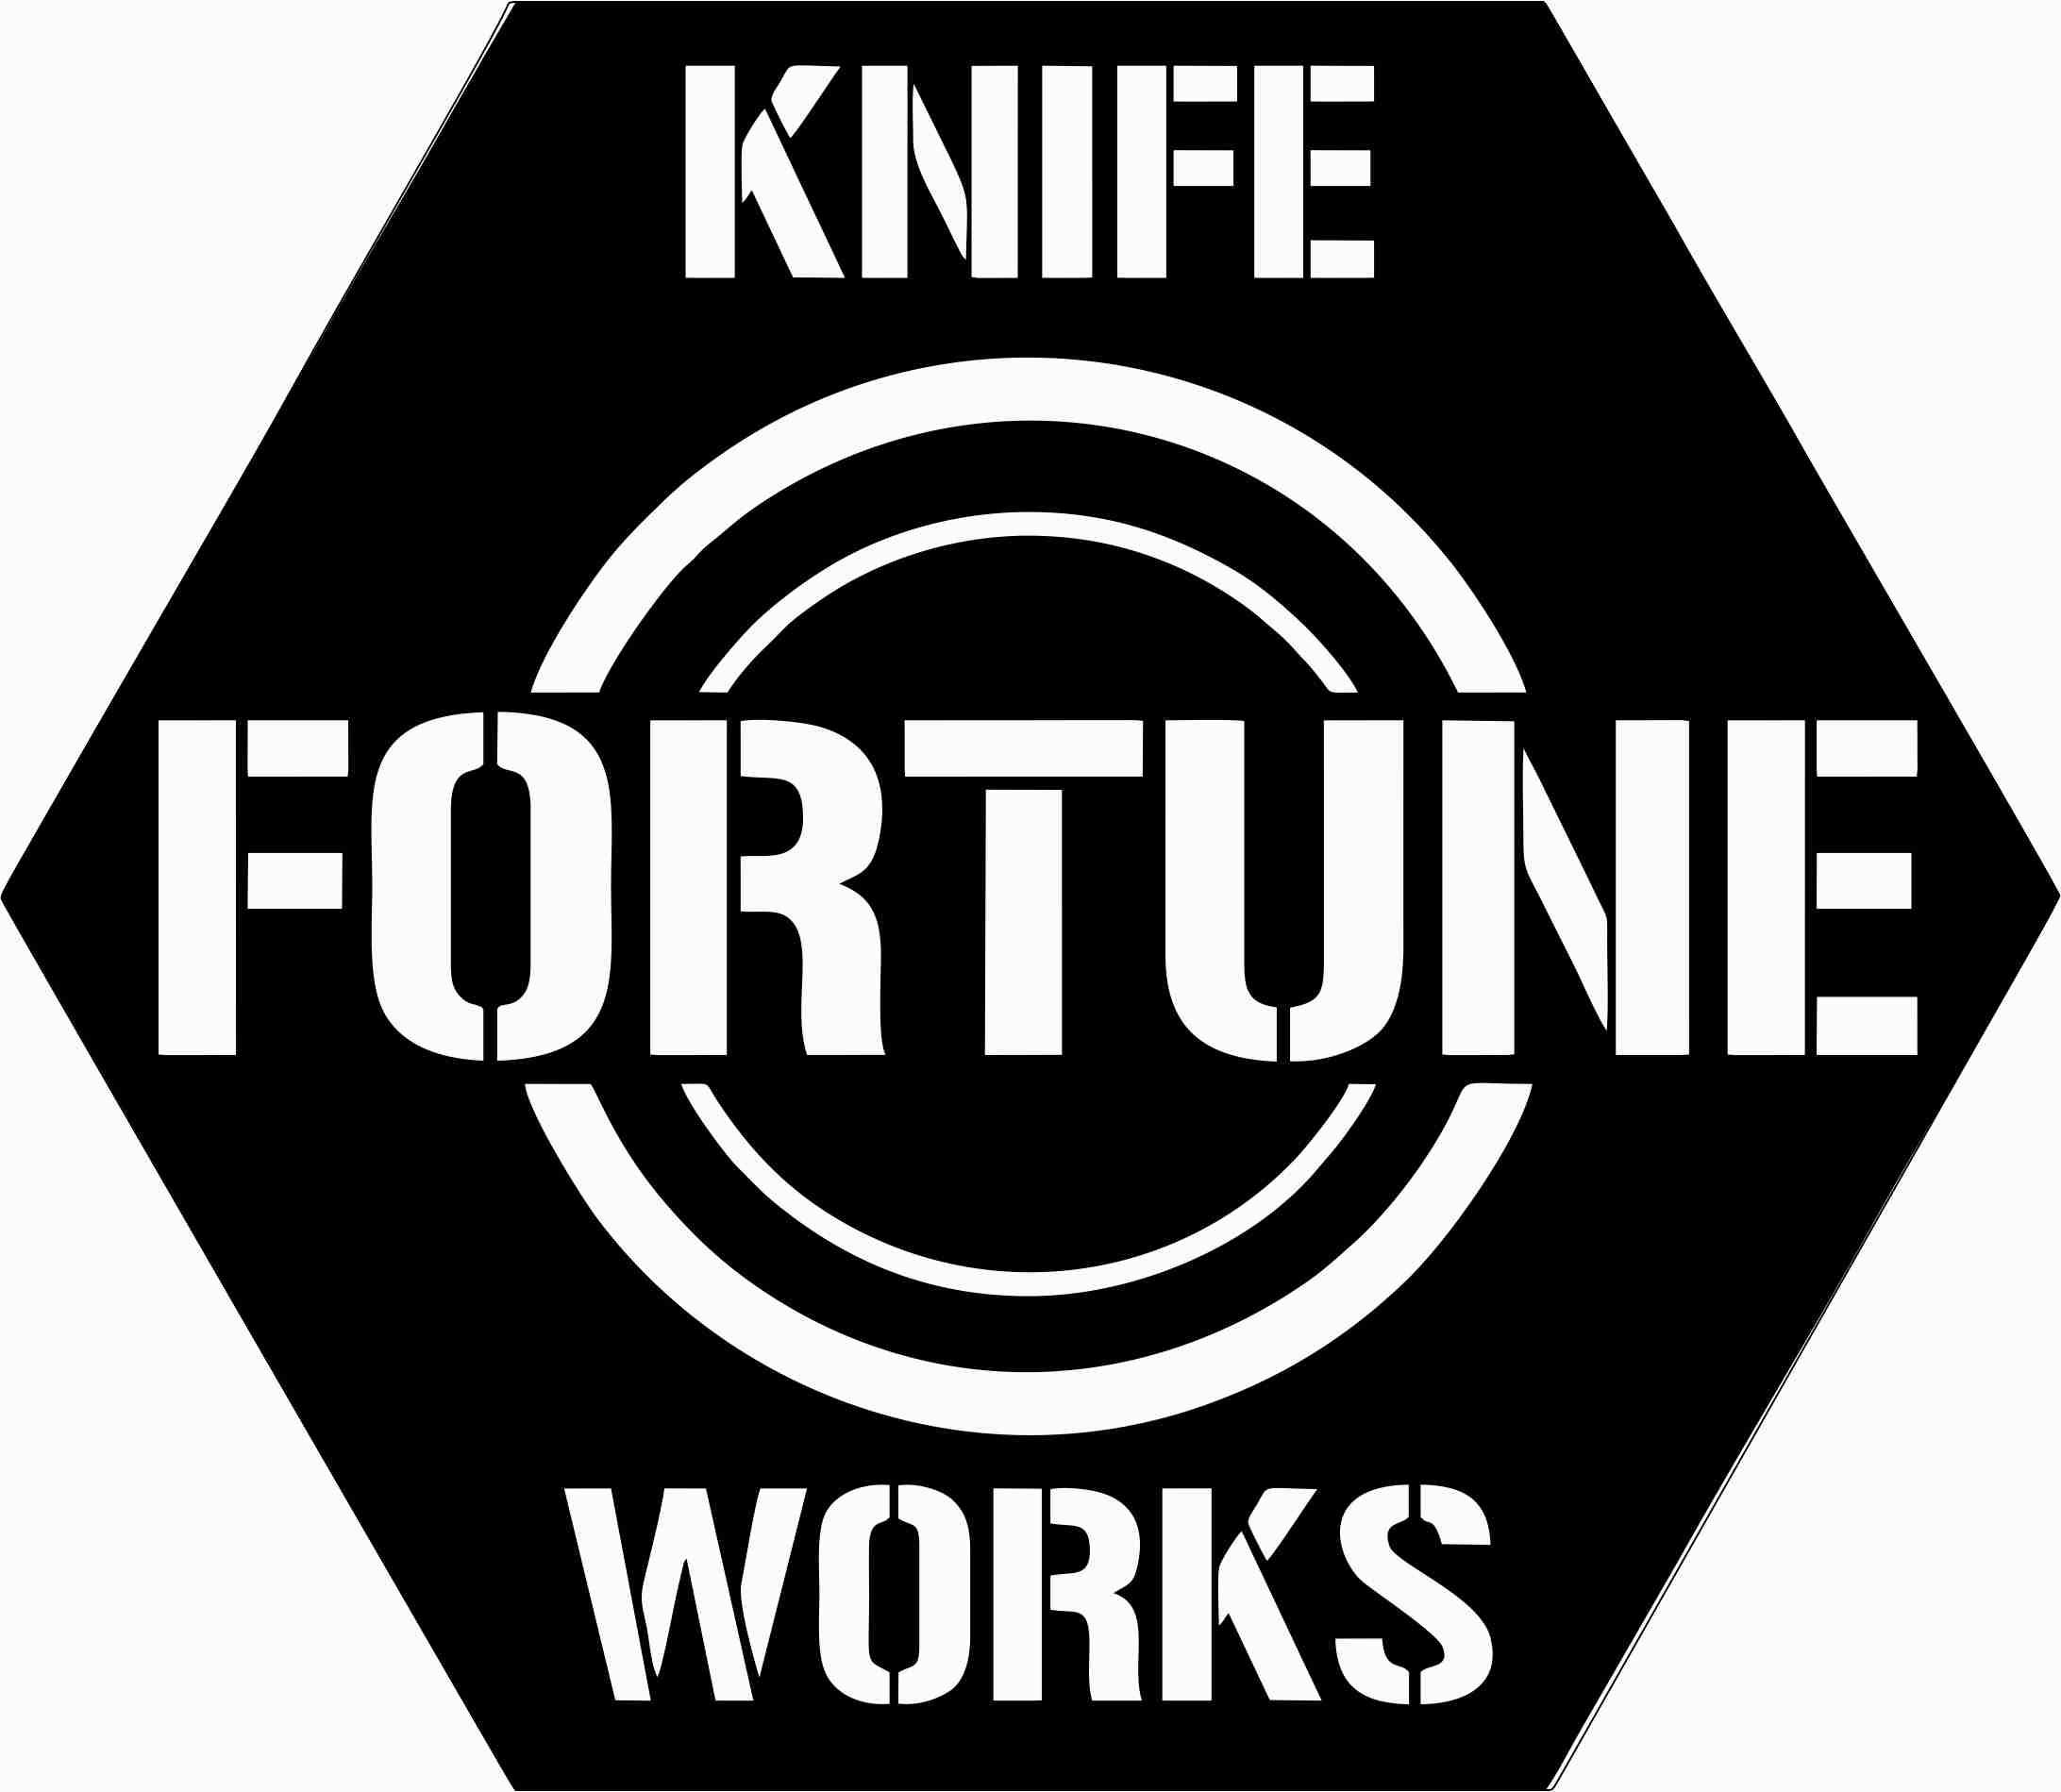 Fortune Knife Works.jpg